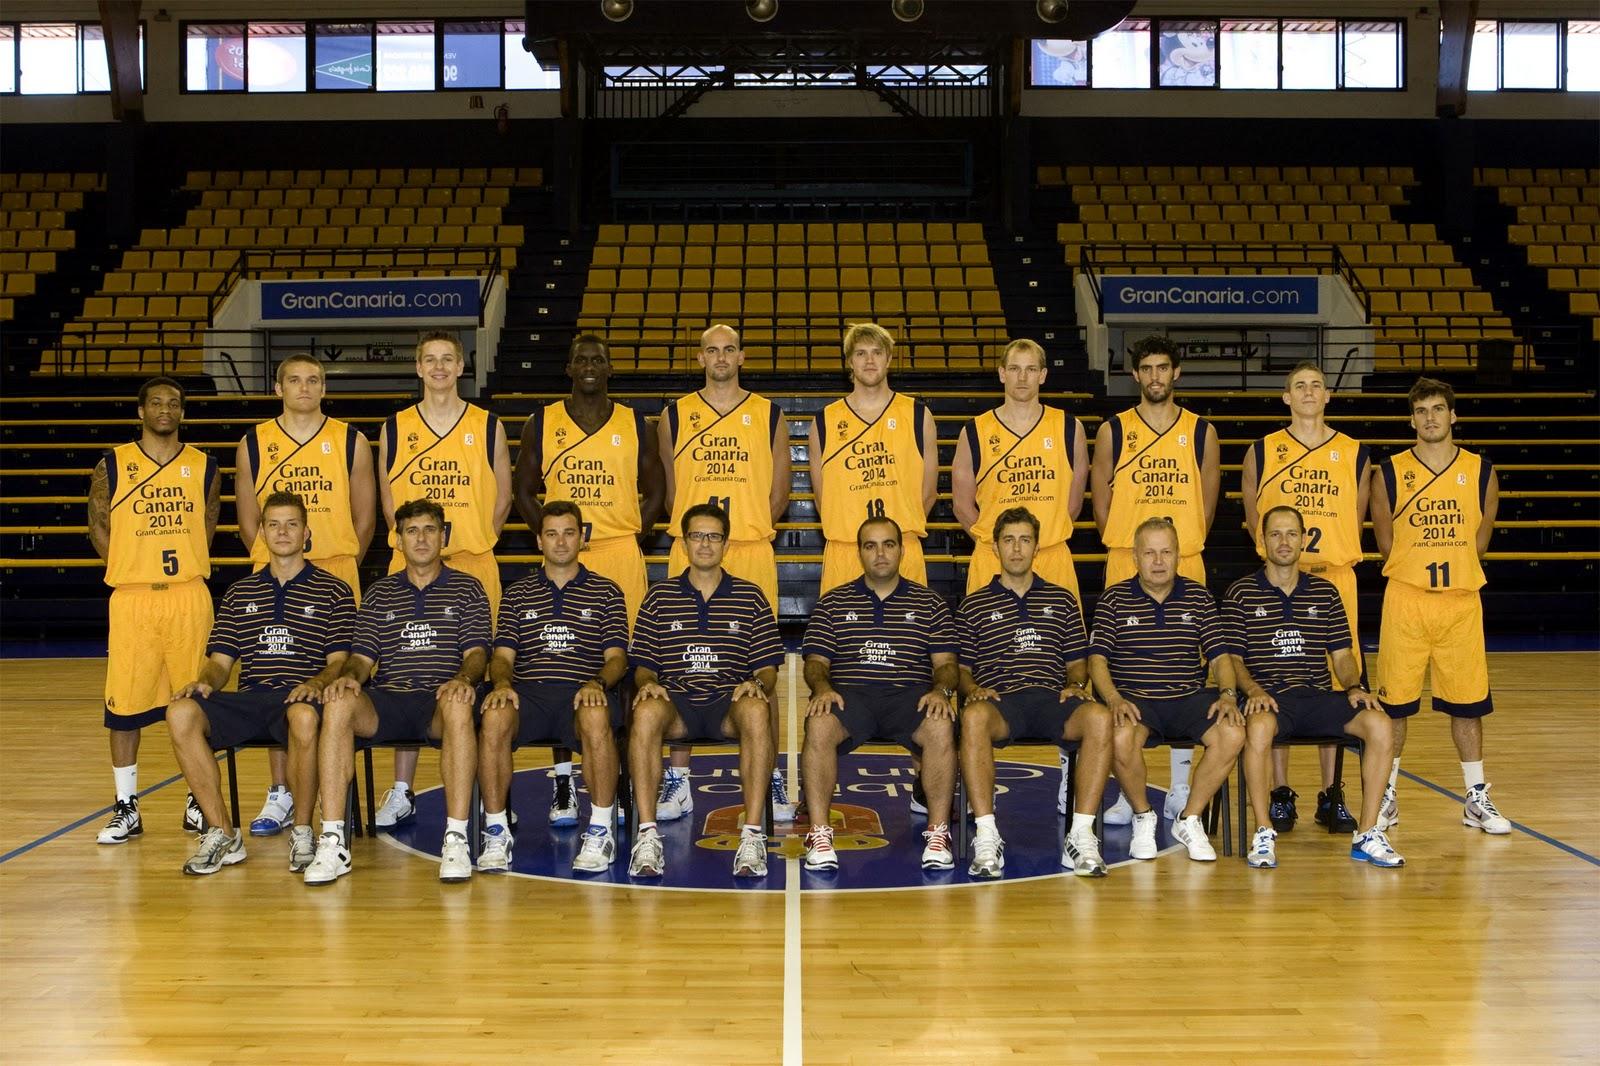 Play Off Liga ACB (4º de Final) Baskonia - Gran Canaria %5B180958%5DGran-Canaria-2014%5B1%5D